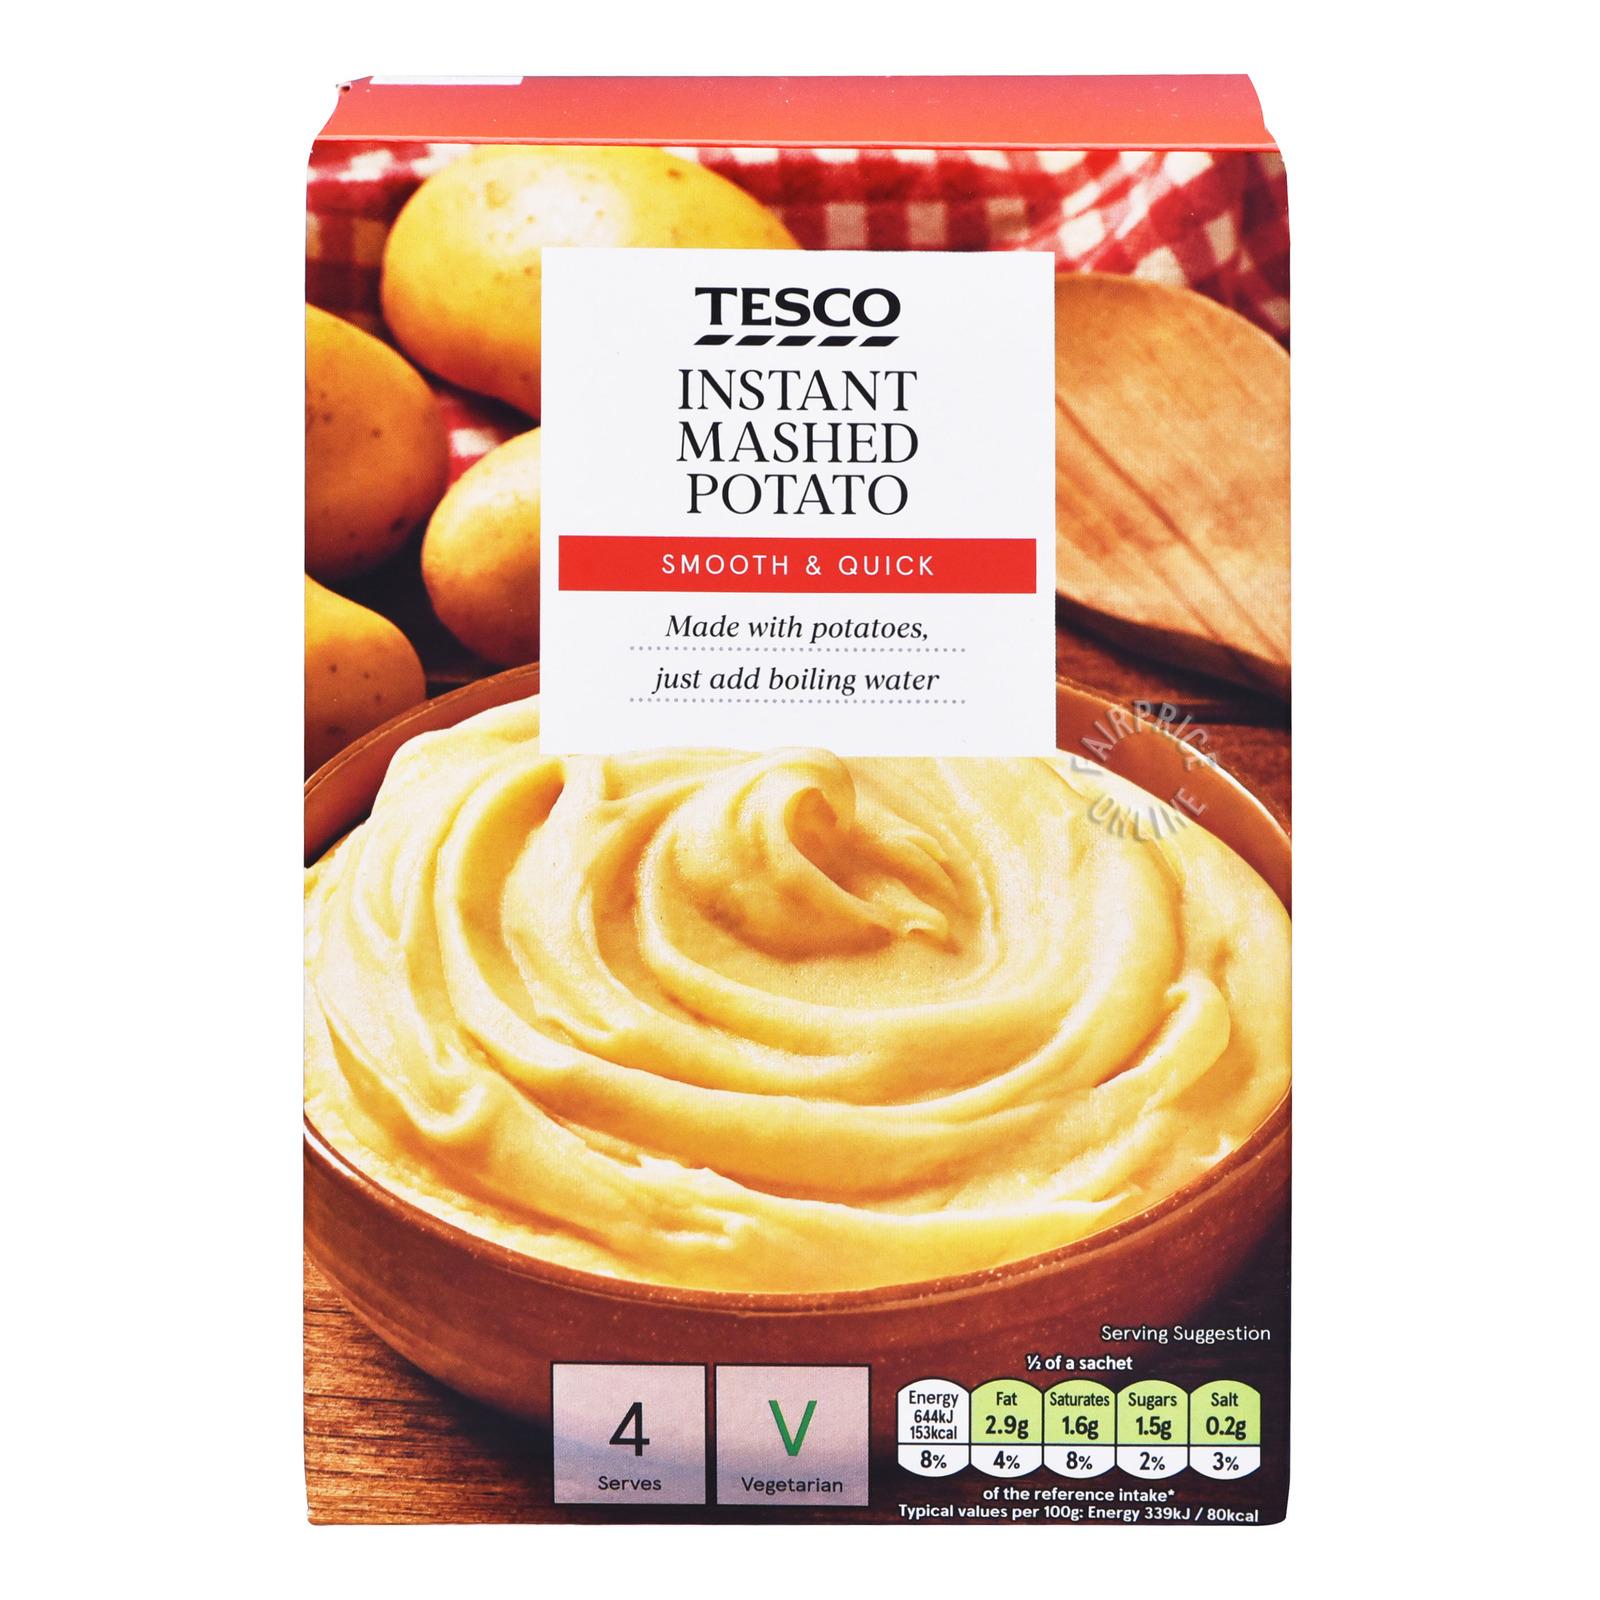 Tesco Instant Mashed Potato